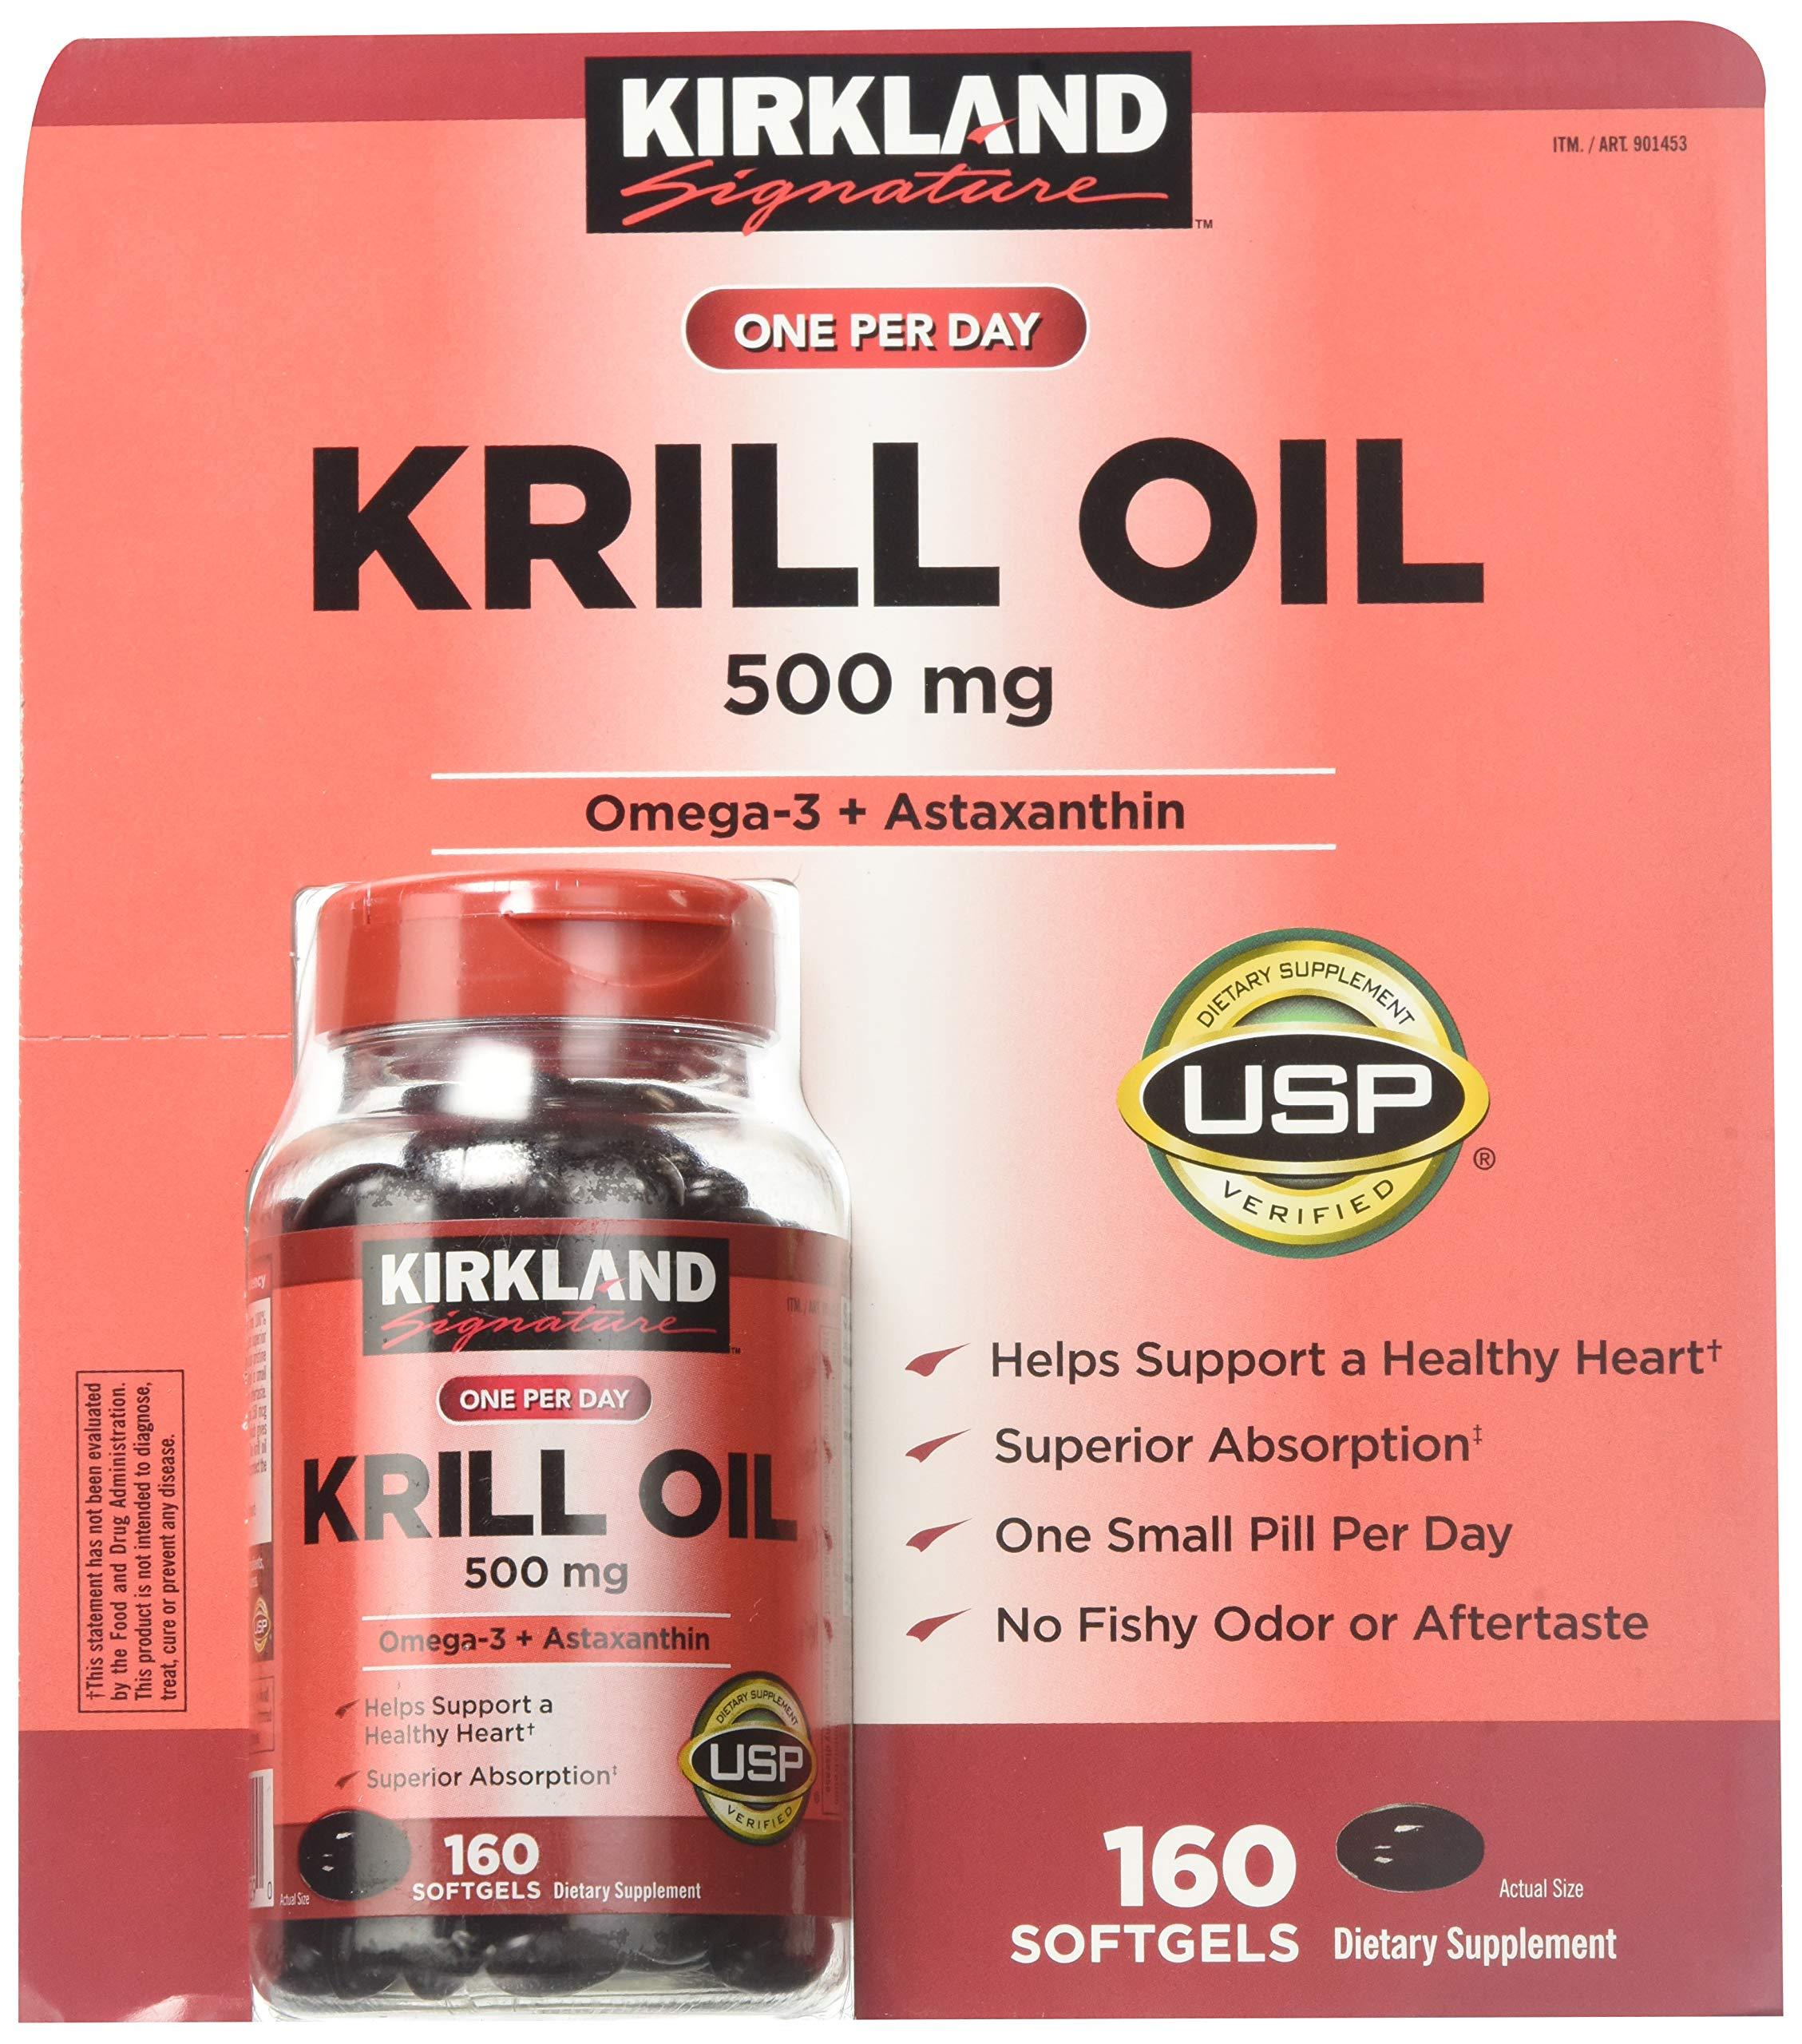 Kirkland Signature Krill Oil 500 mg 160 Softgels (2 Pack) by Kirkland Signature